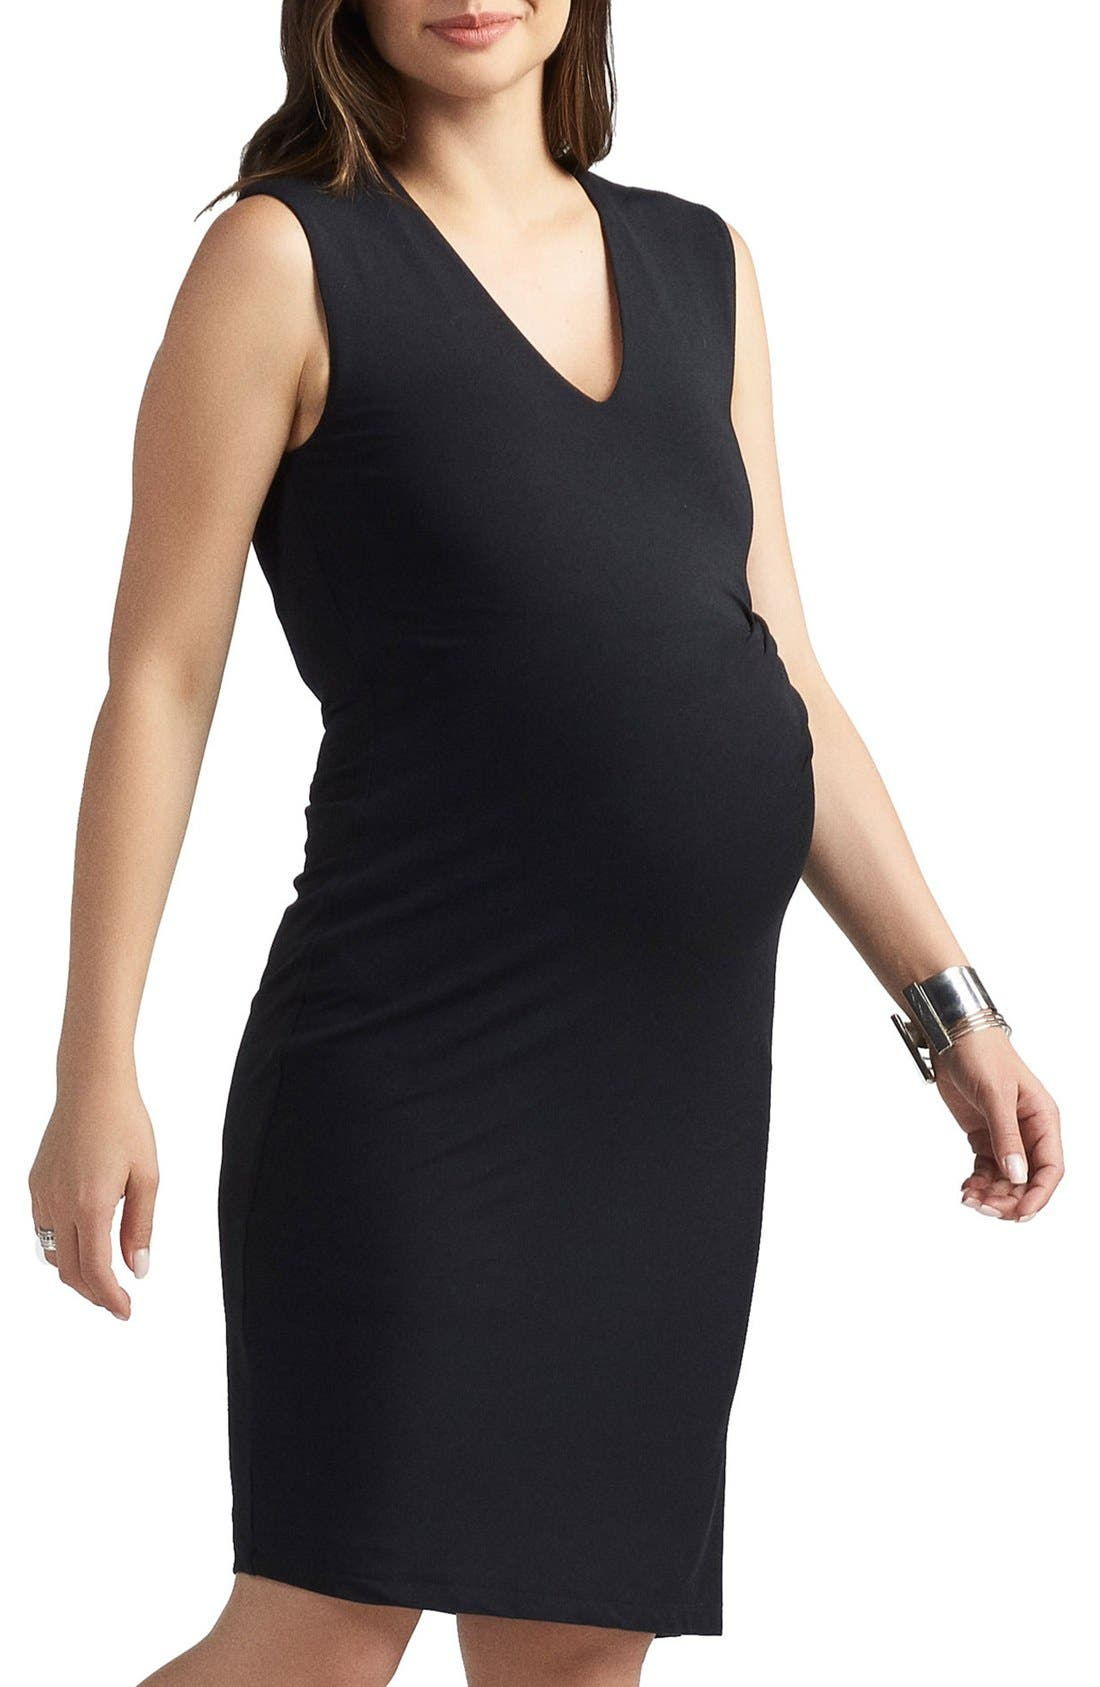 Margaux Maternity Dress,                             Alternate thumbnail 3, color,                             BLACK